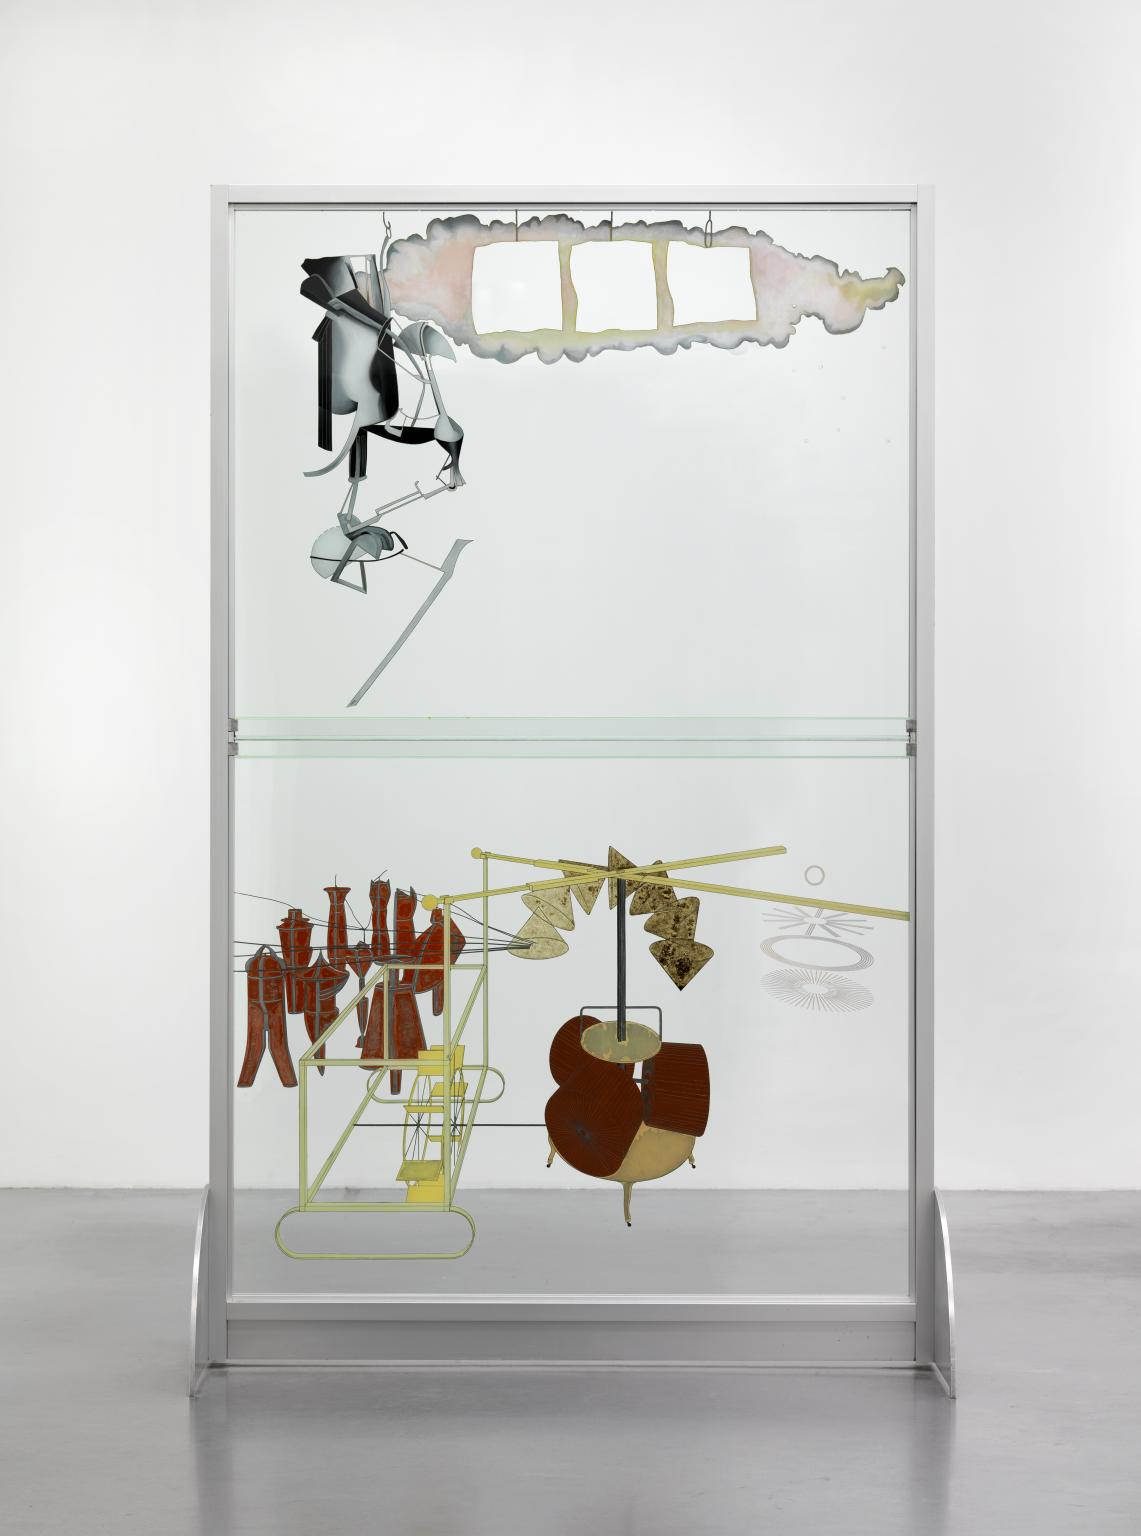 Marcel Duchamp (reconstruction by Richard Hamilton),The Bride Stripped Bare by Her Bachelors, Even (La mariée mise à nu par ses célibataires, même), known as The Large Glass,1915 (reconstructed in 1965–66 and 1985).